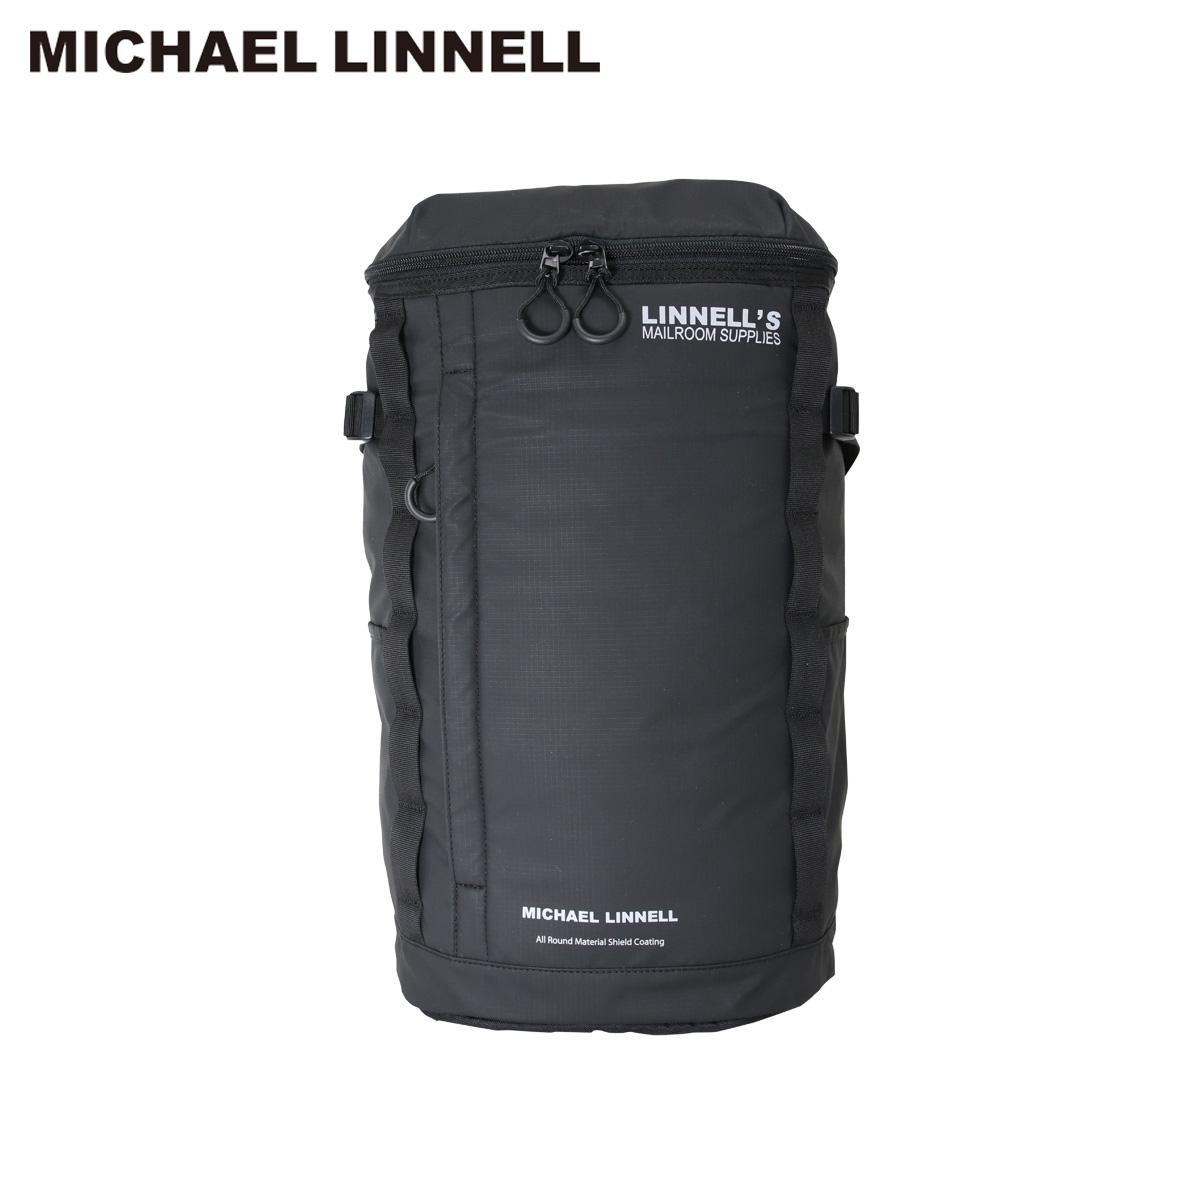 MICHAEL LINNELL ARMS マイケルリンネル リュック バッグ 31L メンズ レディース バックパック ブラック 黒 MLAC-14